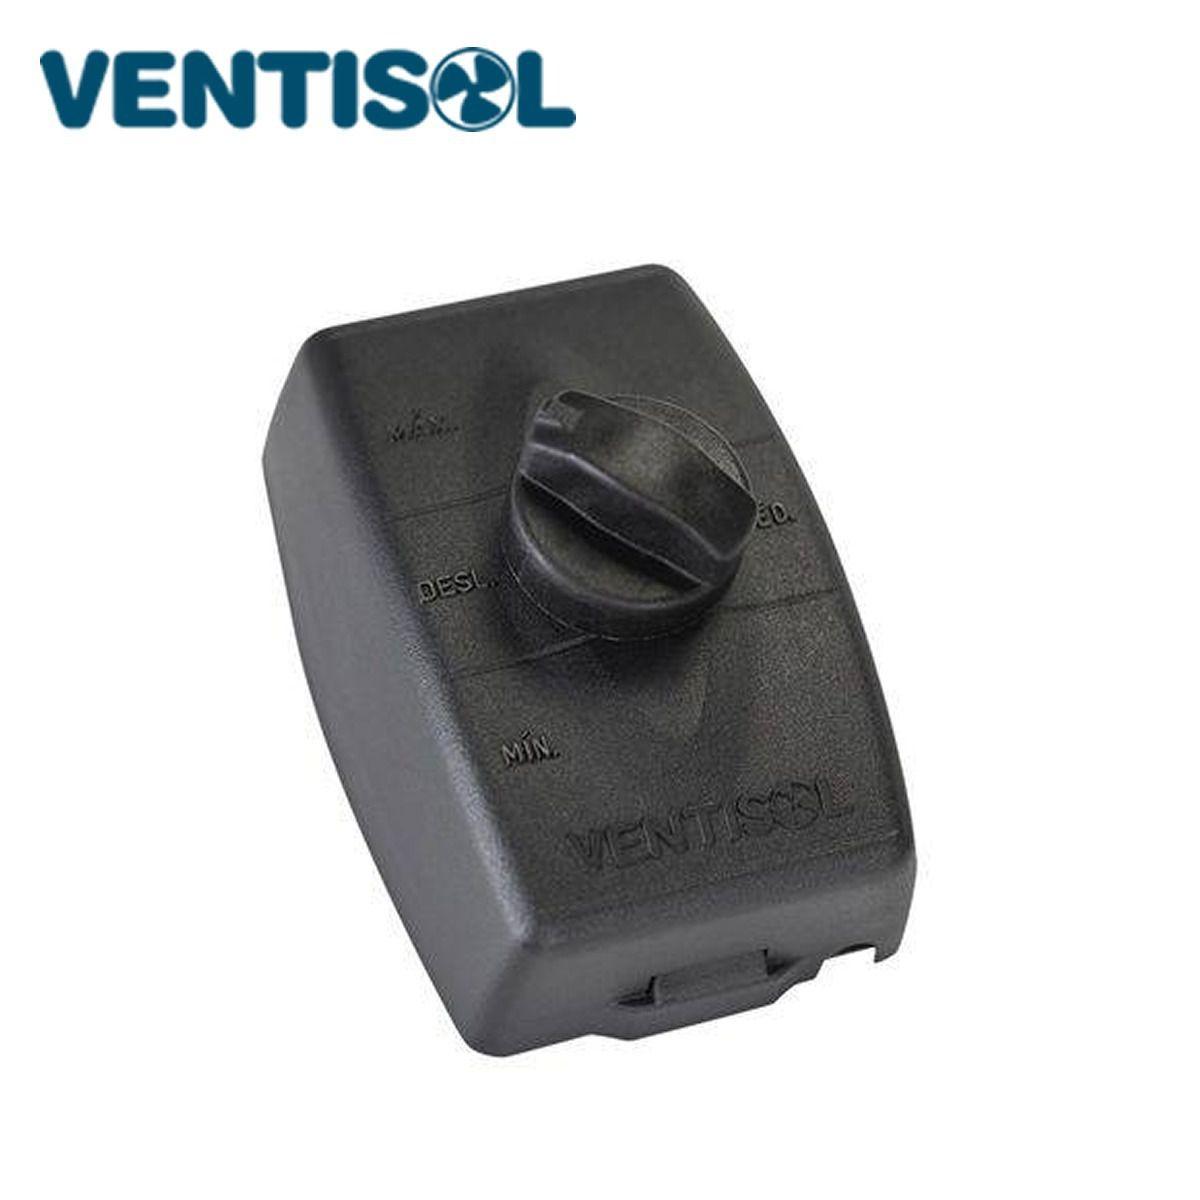 Controle De Velocidade Ventilador Ventisol 60cm Preto Novo